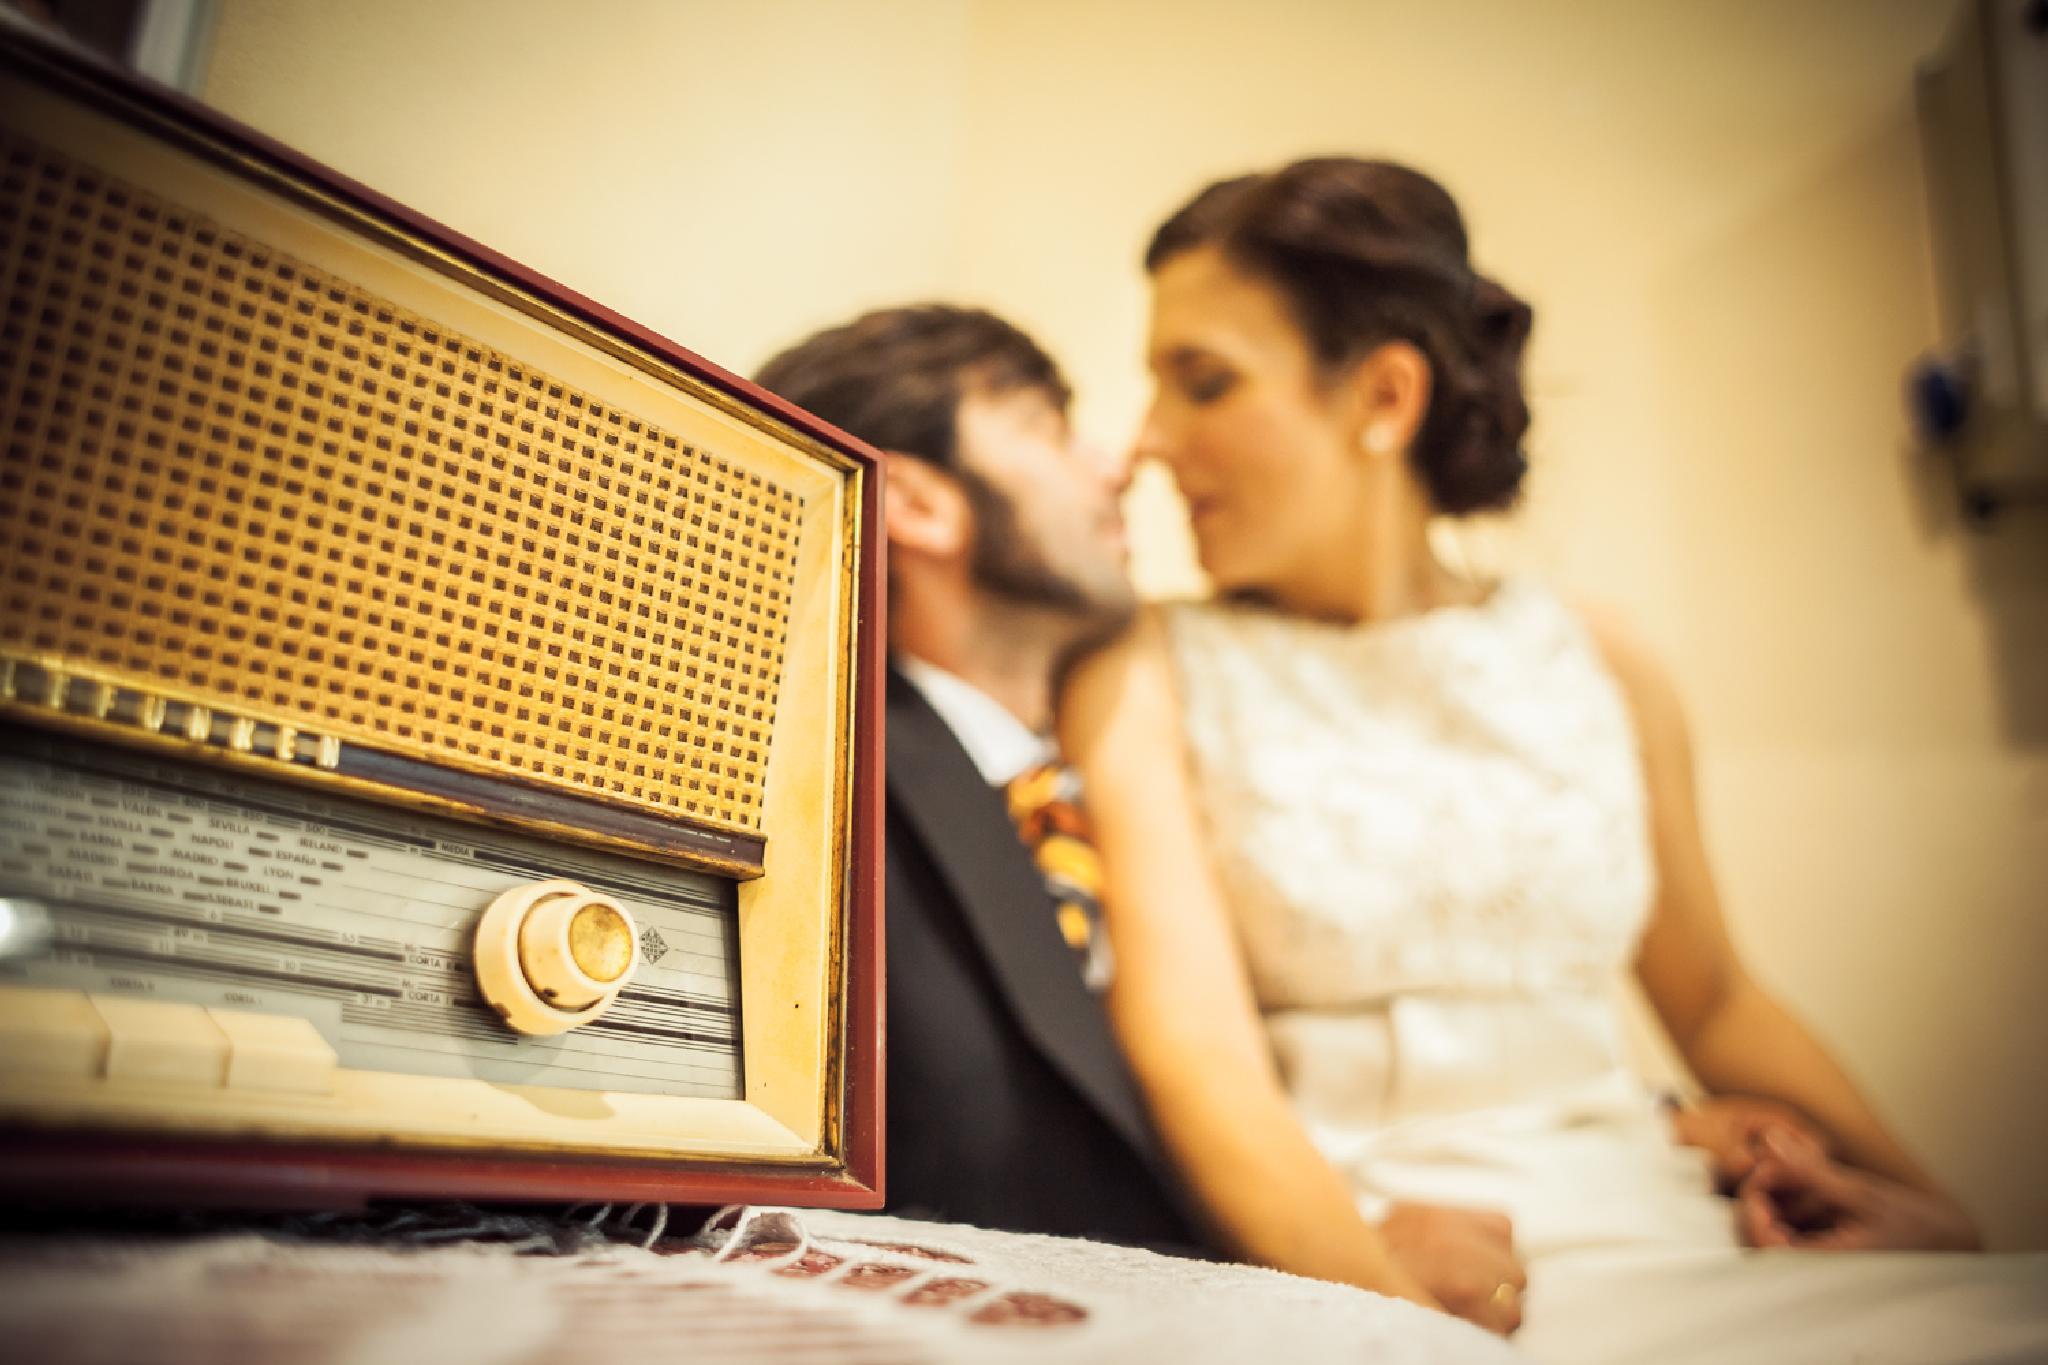 Radio Wedding by pitigarcia